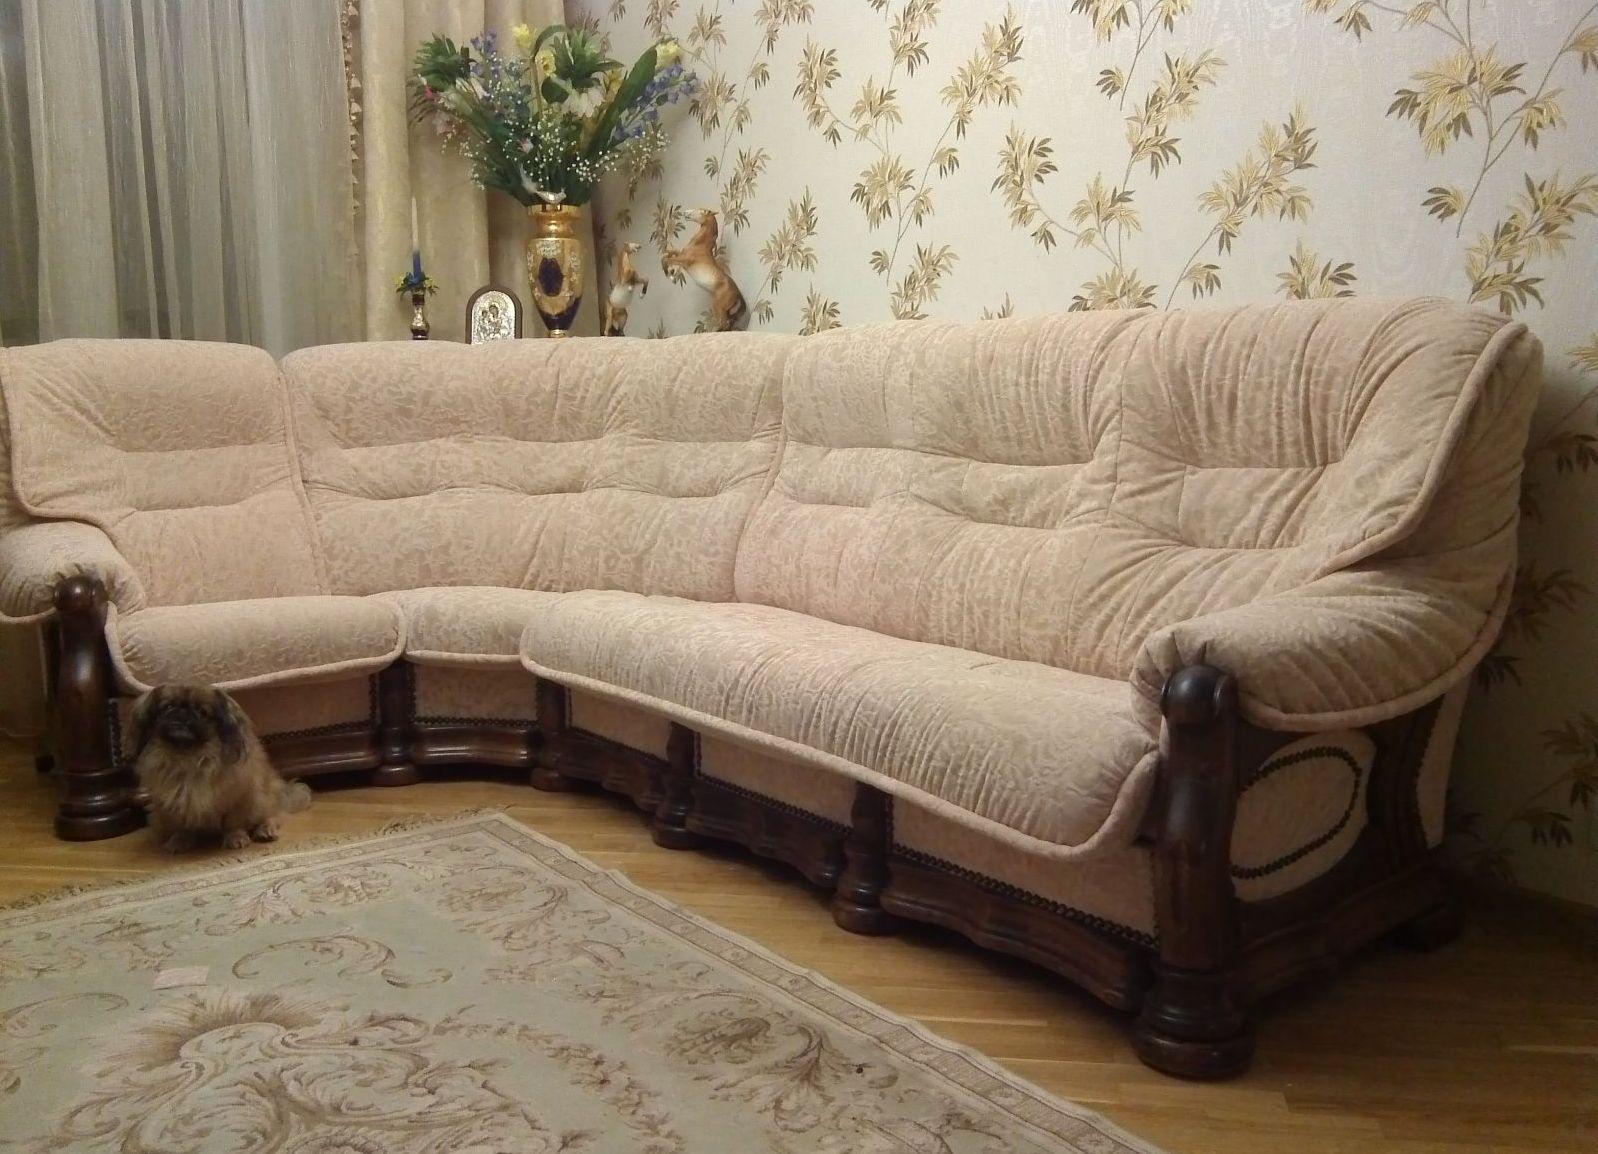 накидка на угловой диван своими руками